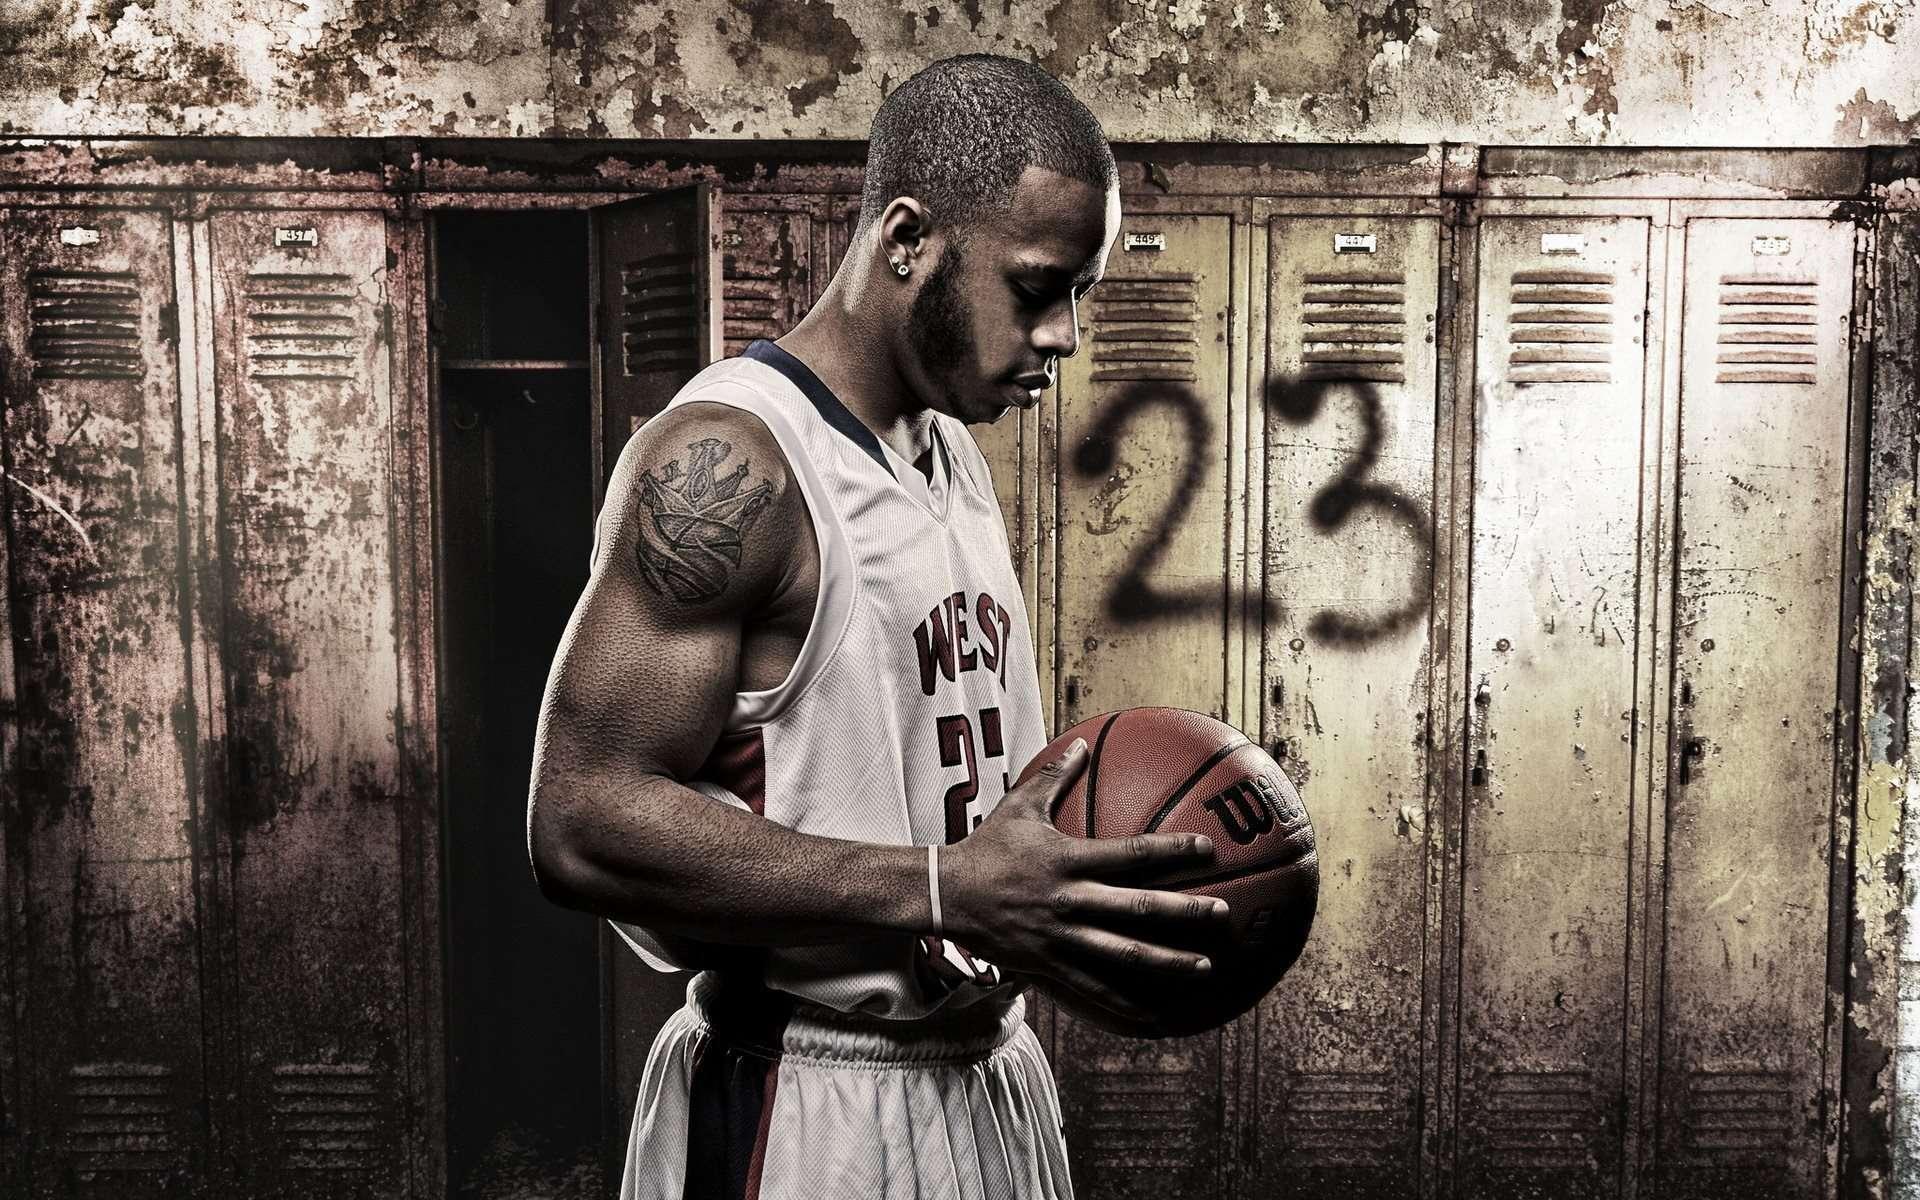 Terrence Basketball Player Wallpapers